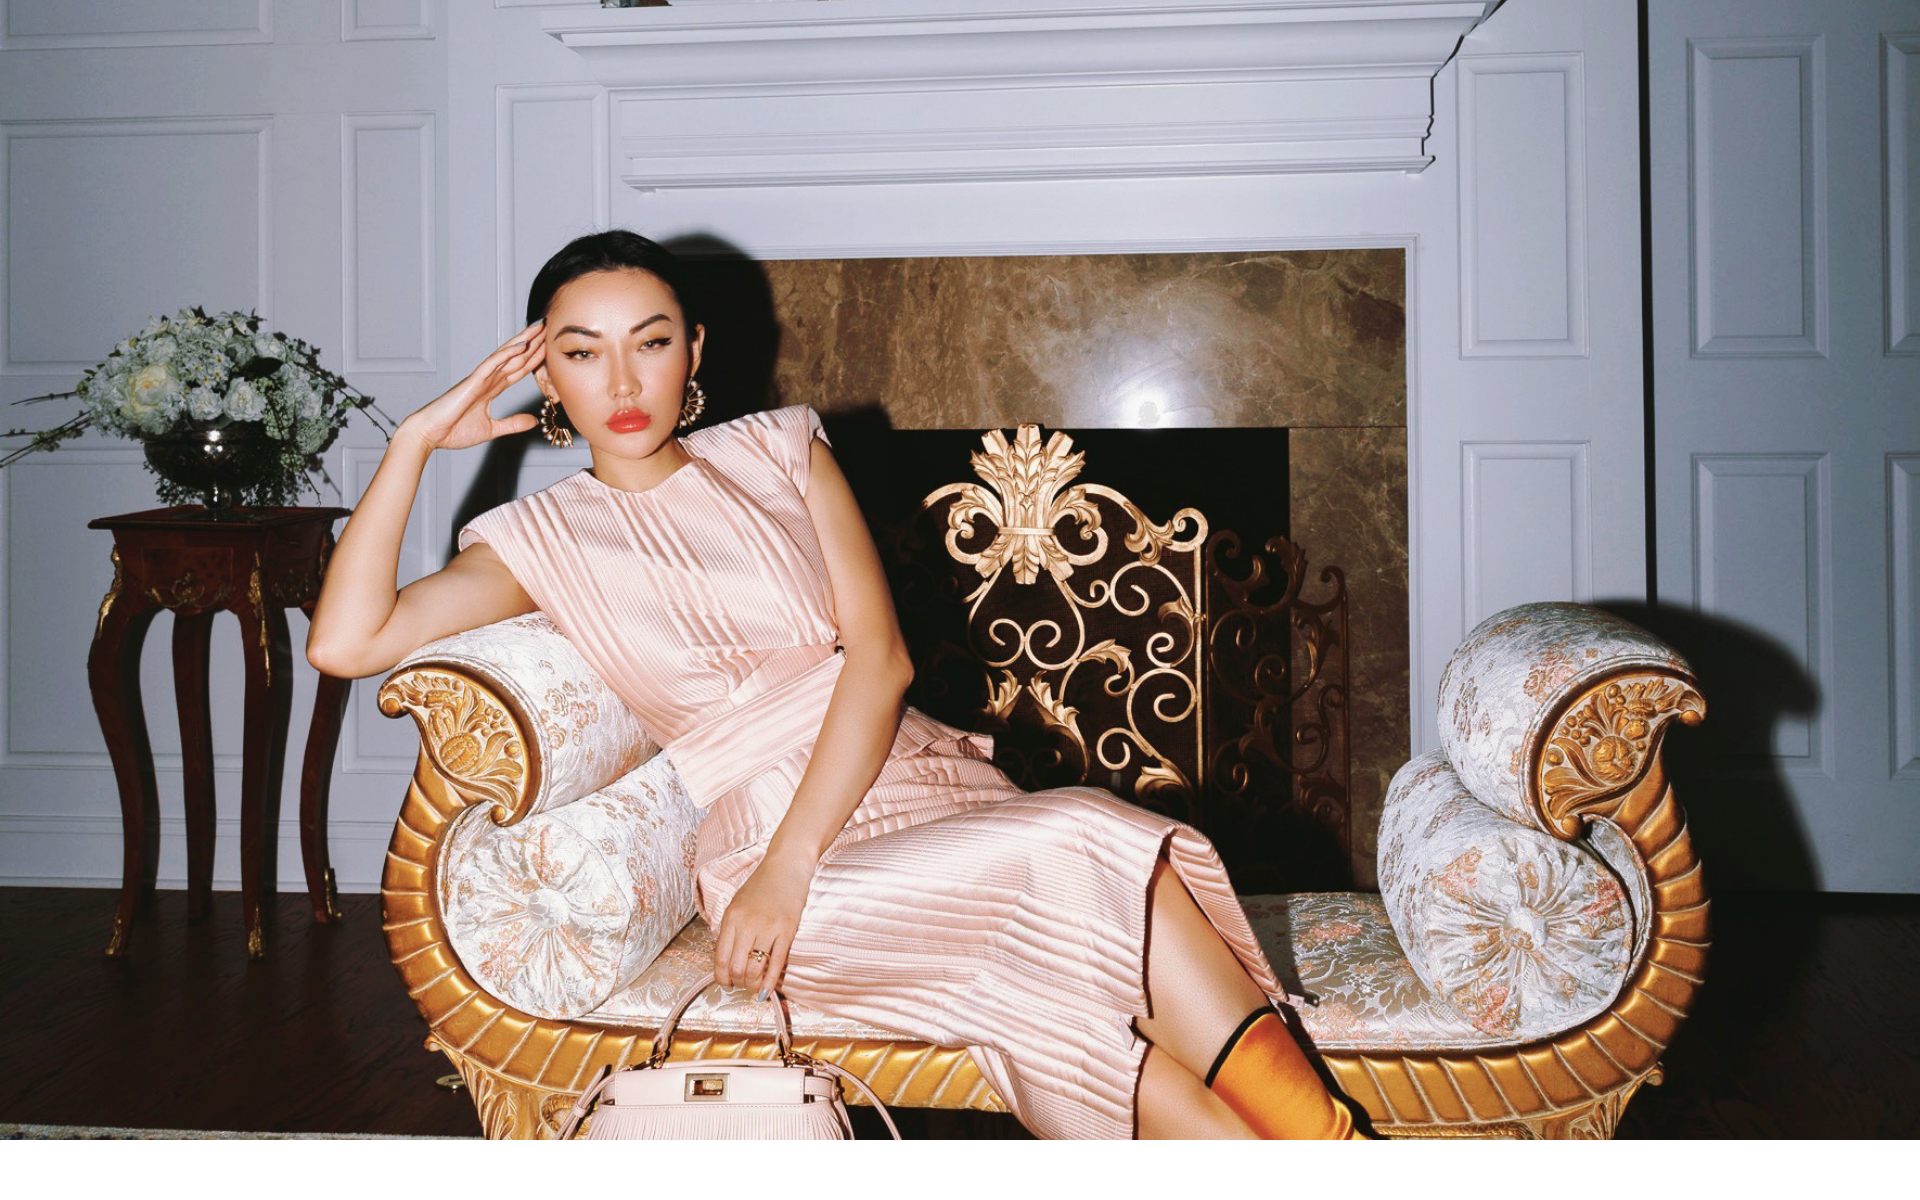 Social Media Star Jessica Wang Talks About Her Digital Influence On Instagram & TikTok